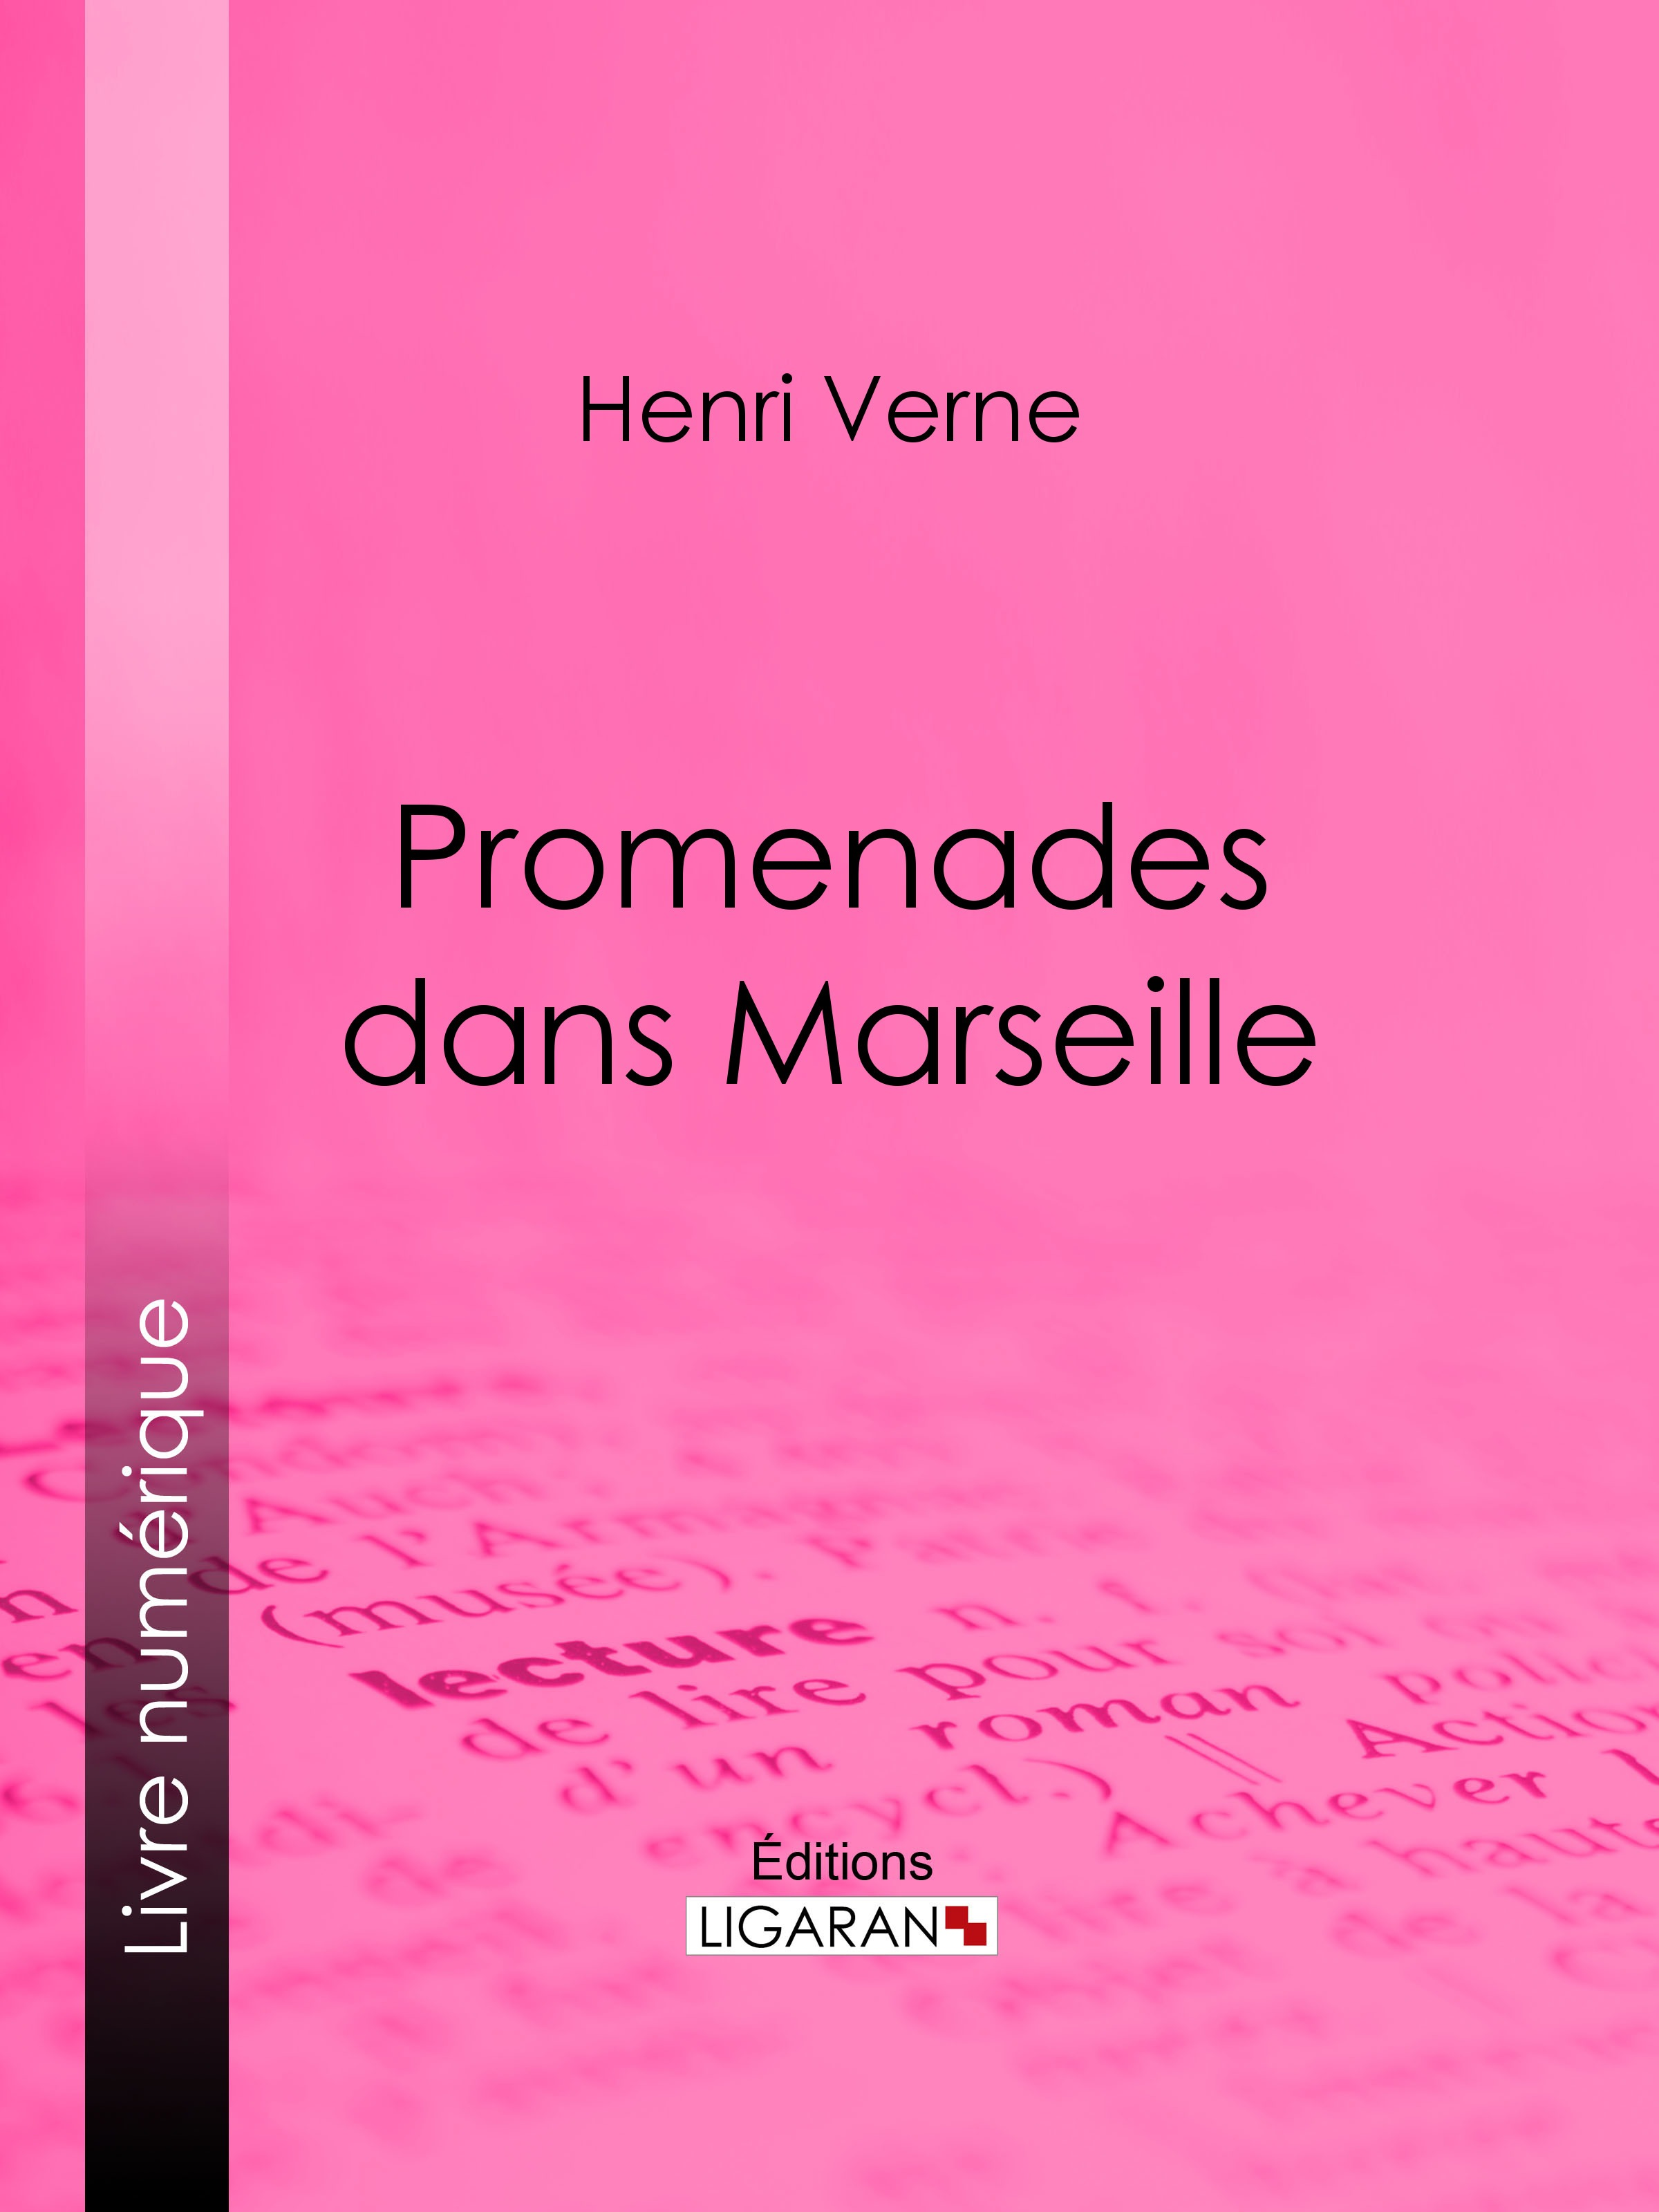 Promenades dans Marseille